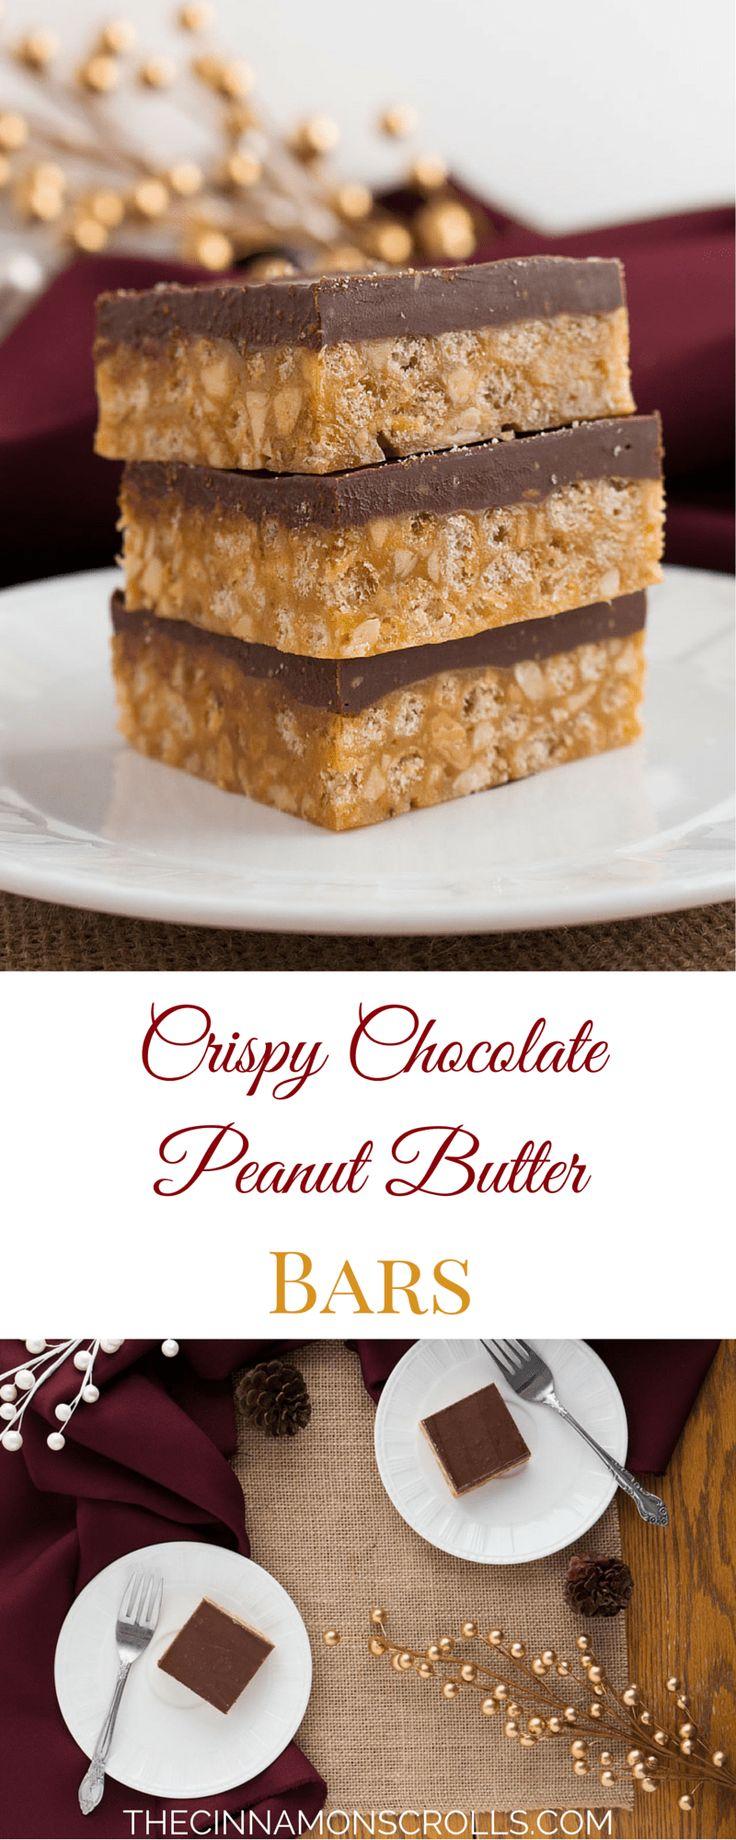 Crispy Chocolate Peanut Butter Bars | thecinnamonscrolls.com @cinnamonscribe